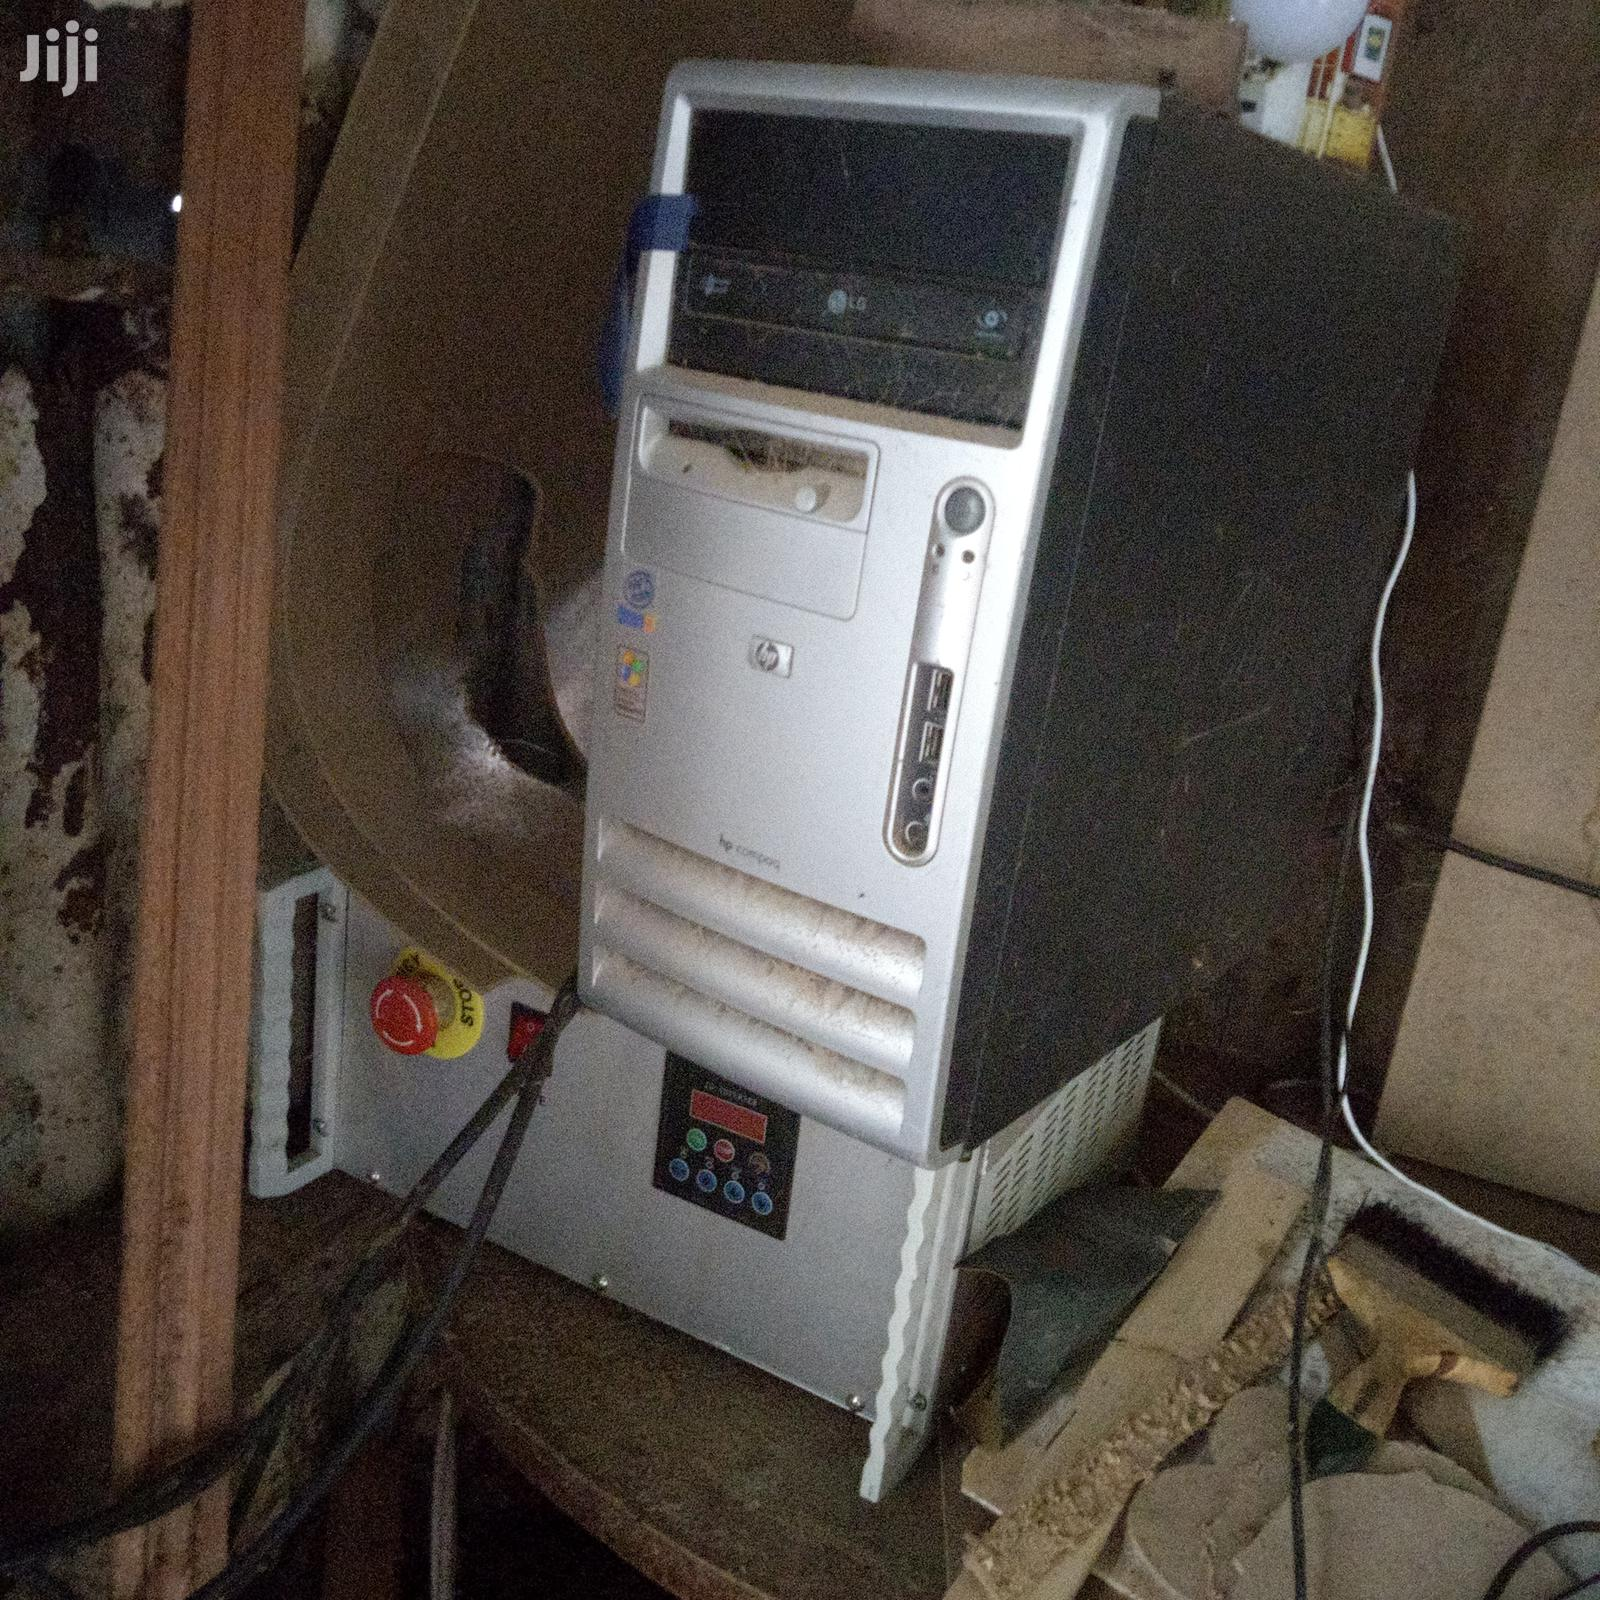 Kress Cnc Machine For Computer Design On Wood Or Mfg | Manufacturing Equipment for sale in Karen, Nairobi, Kenya